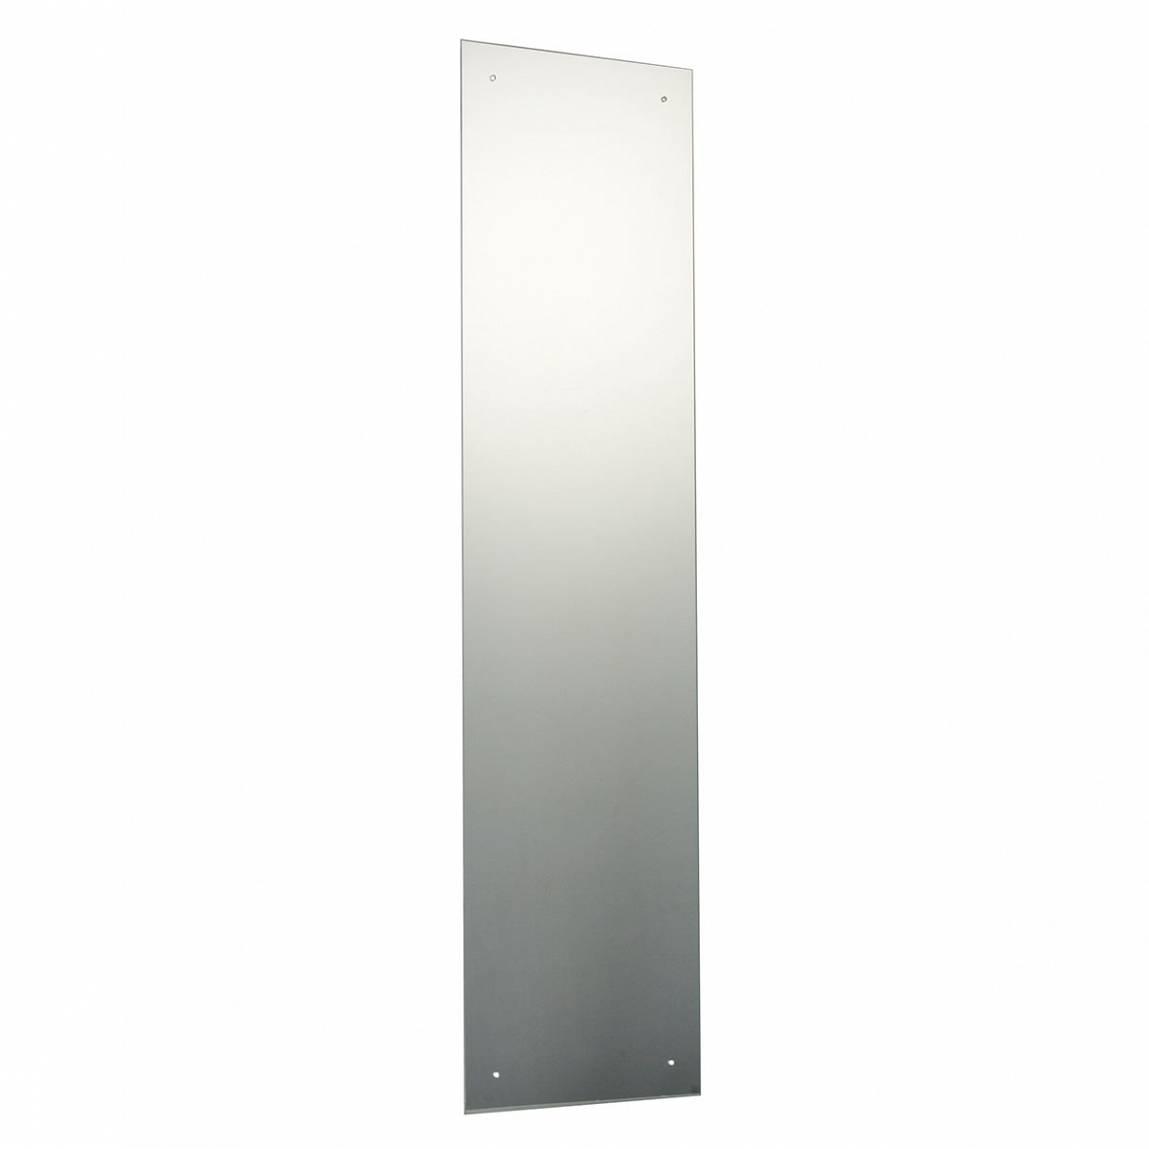 Image of Rectangular Drilled Mirror 120x30cm